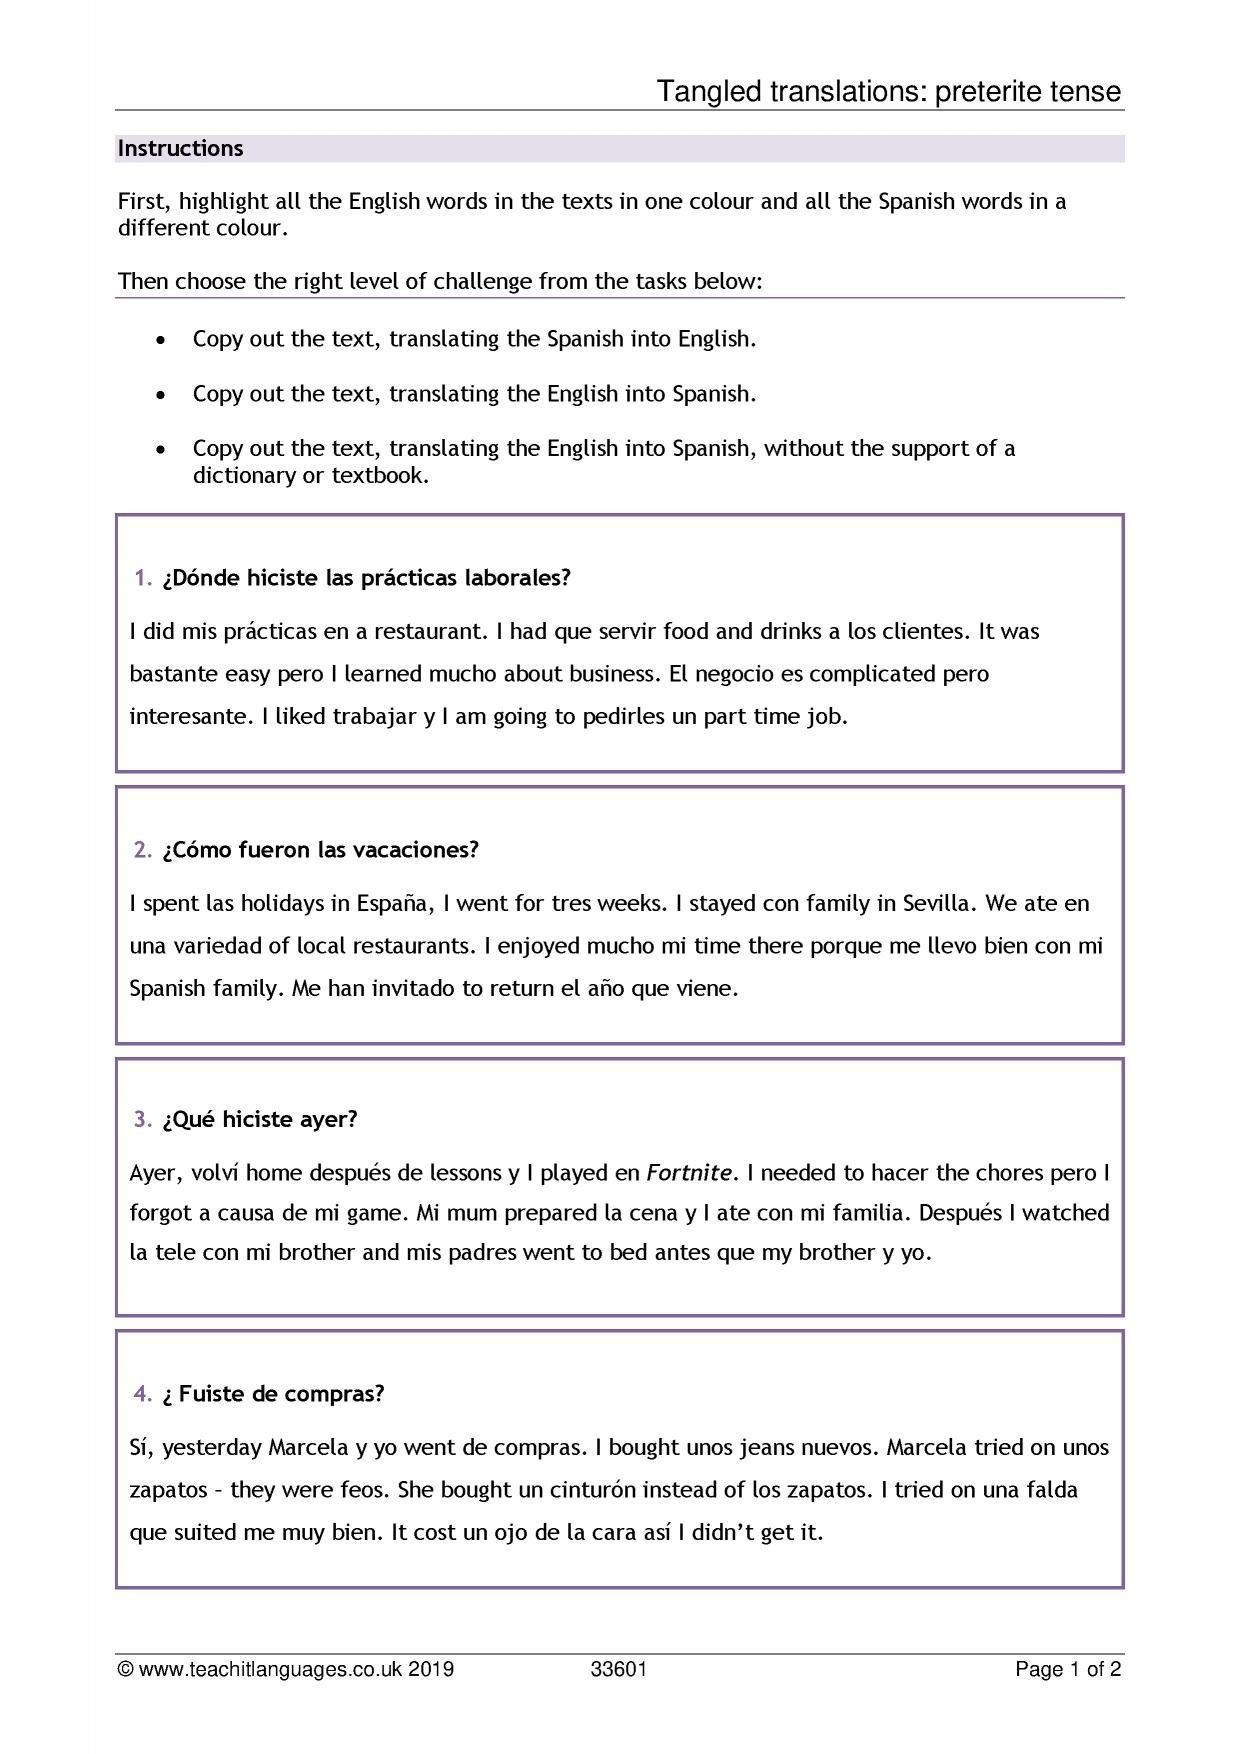 Spanish Language Teaching Resources  Teachit Languages Also Basic English For Spanish Speakers Worksheets